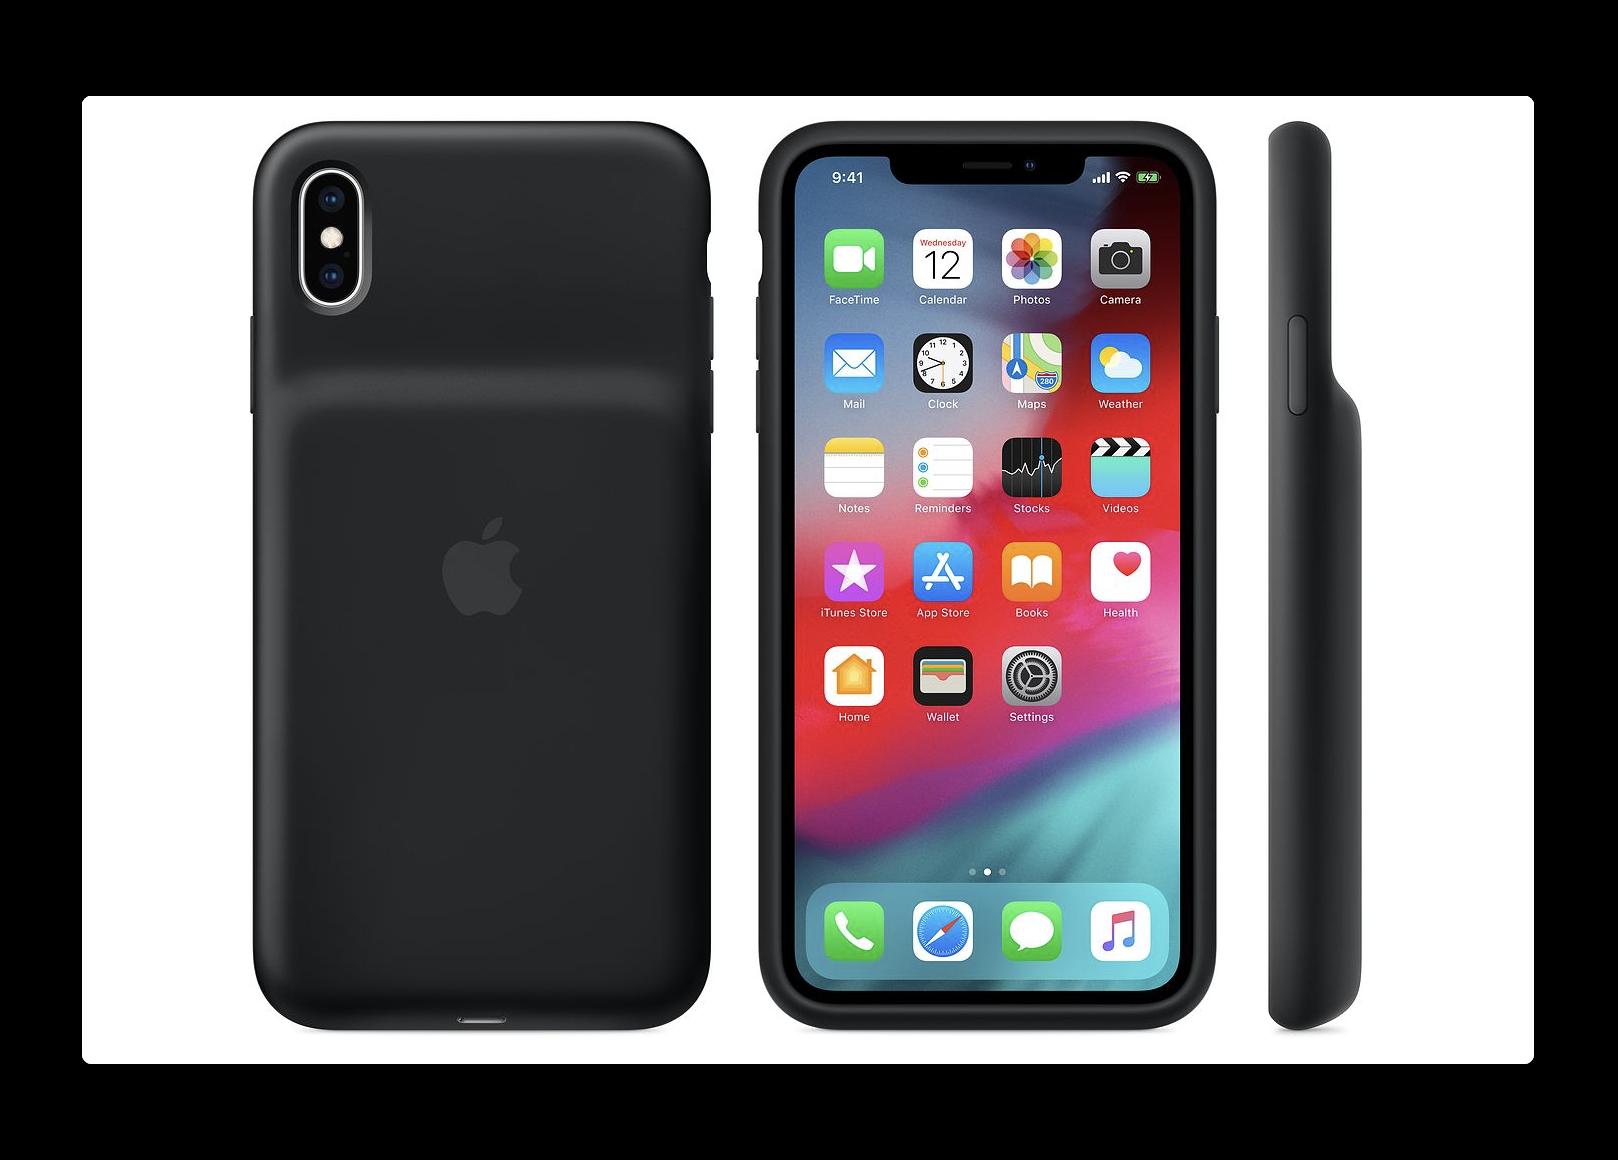 iPhone XS Smart Battery Case使用後、最大バッテリ容量が低下する問題が報告される